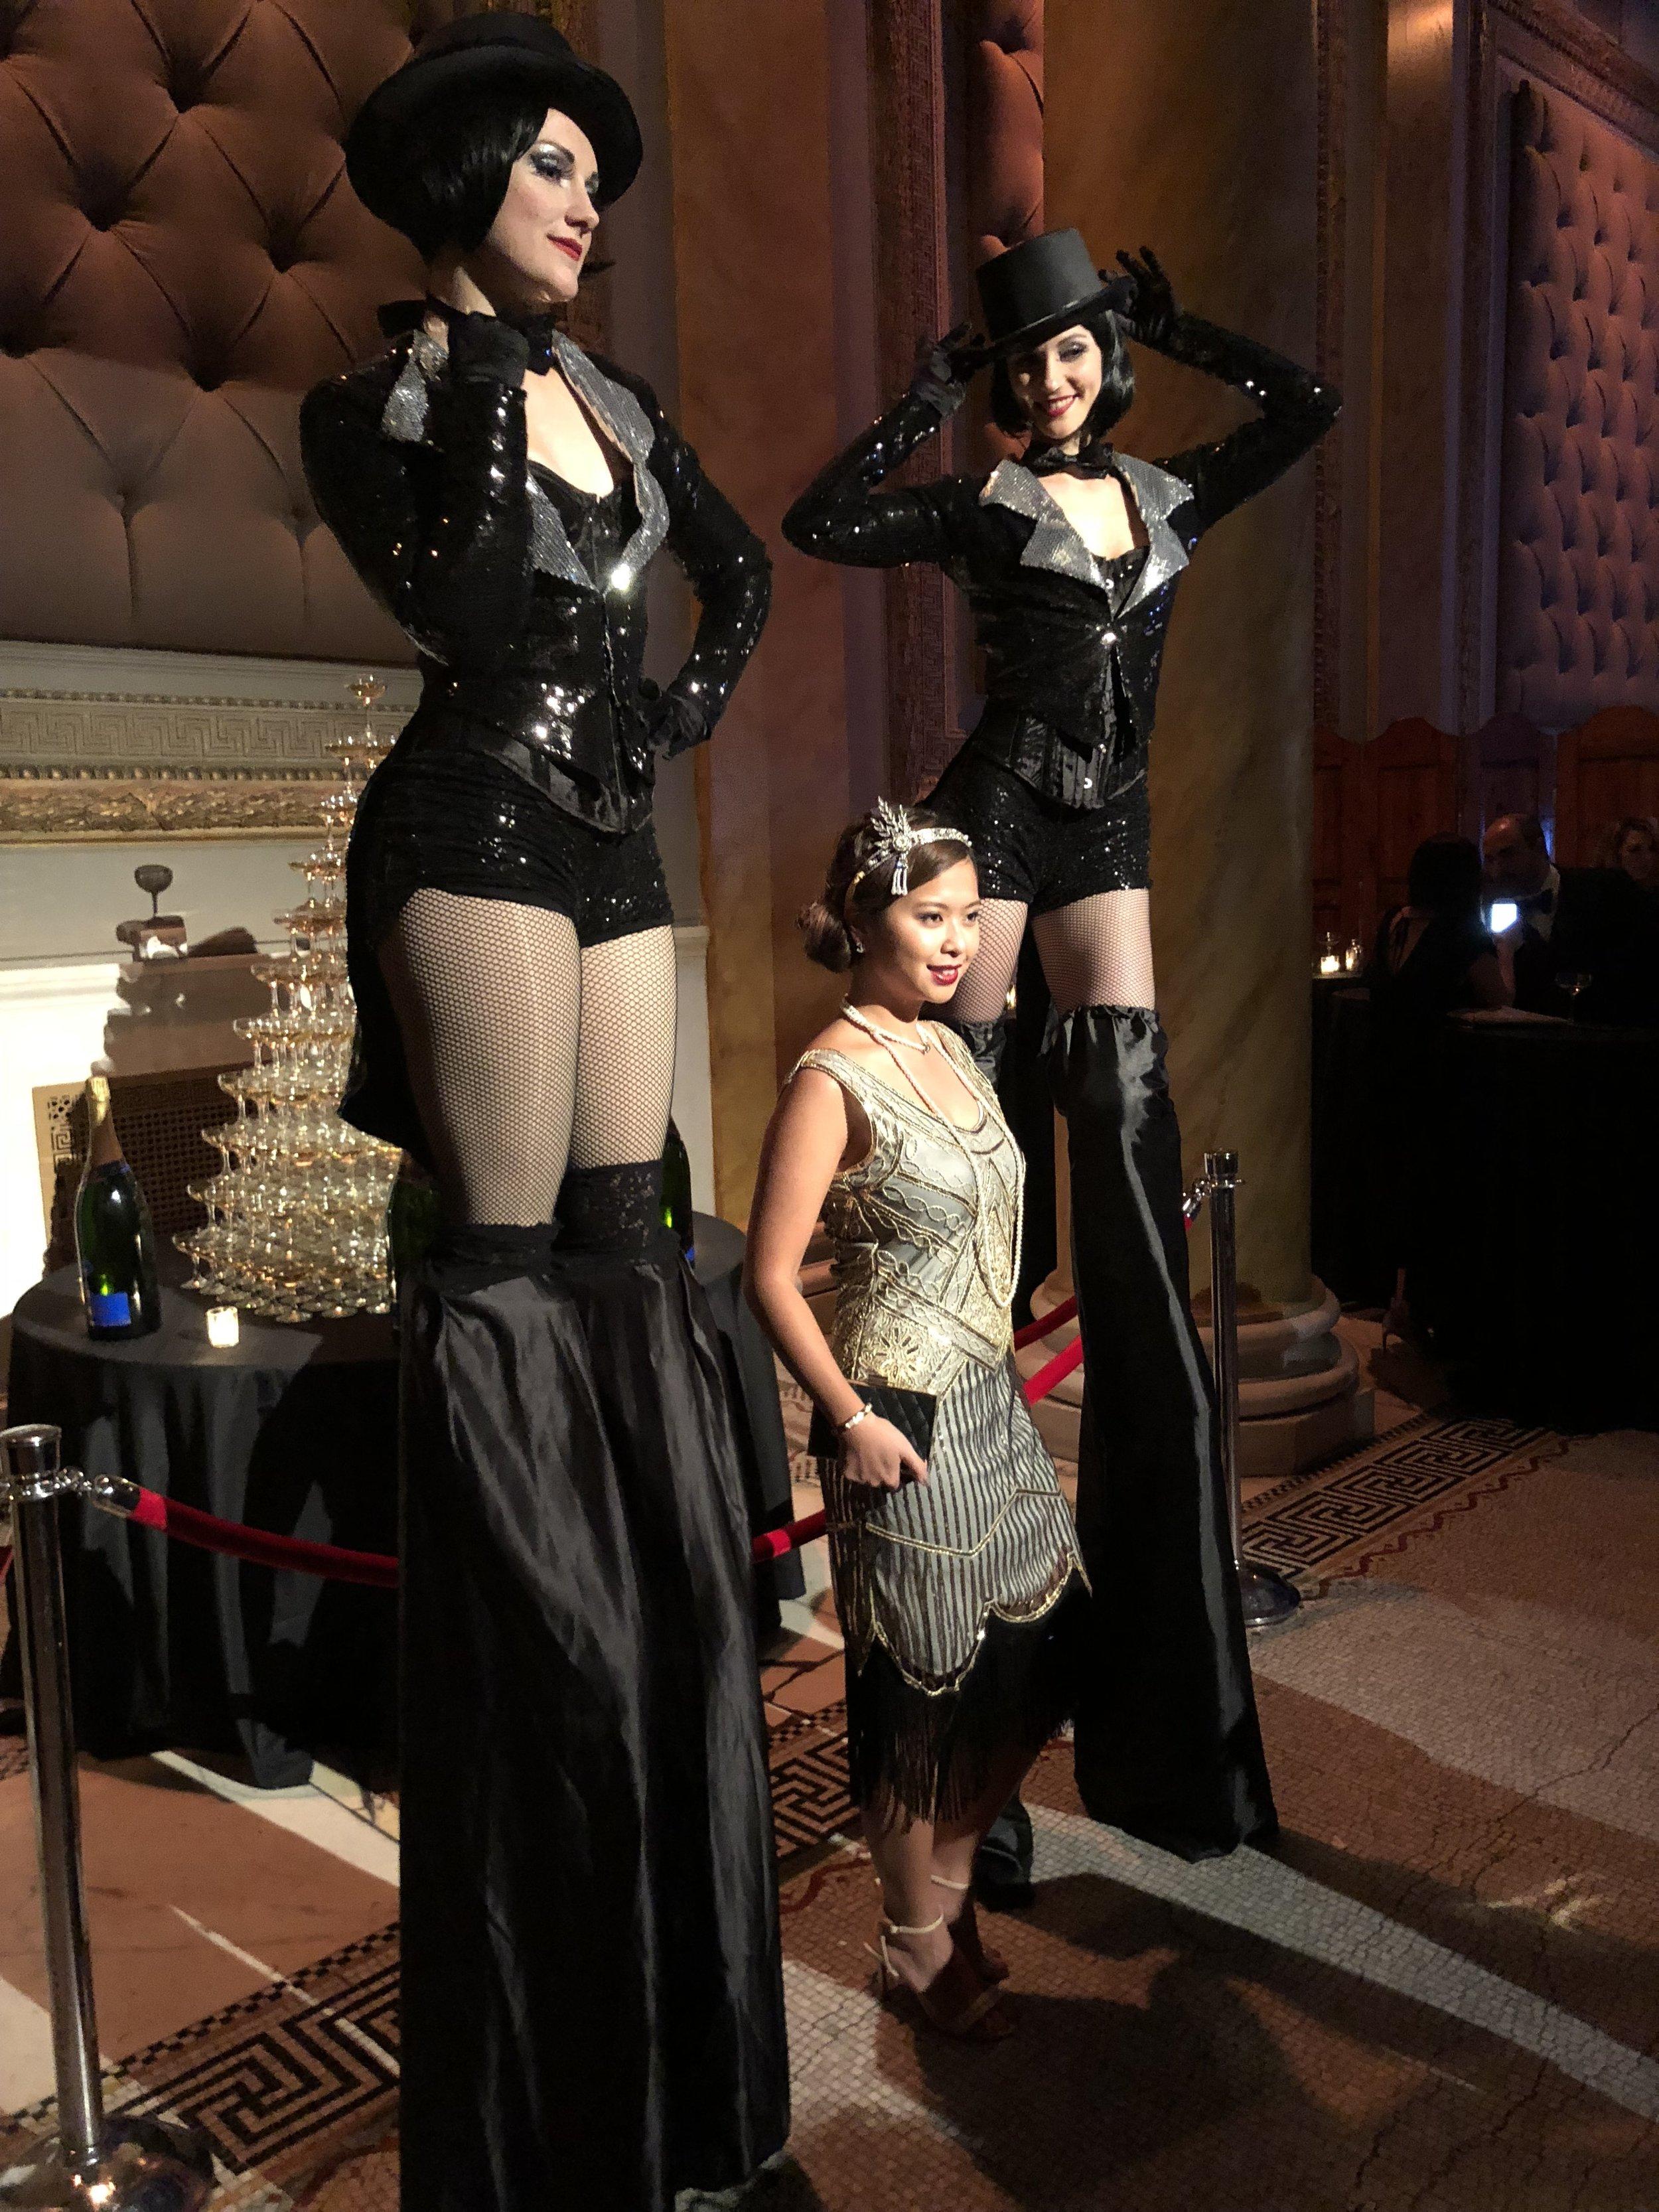 Gatsby Tuxedo Stilt Walker Showgirls